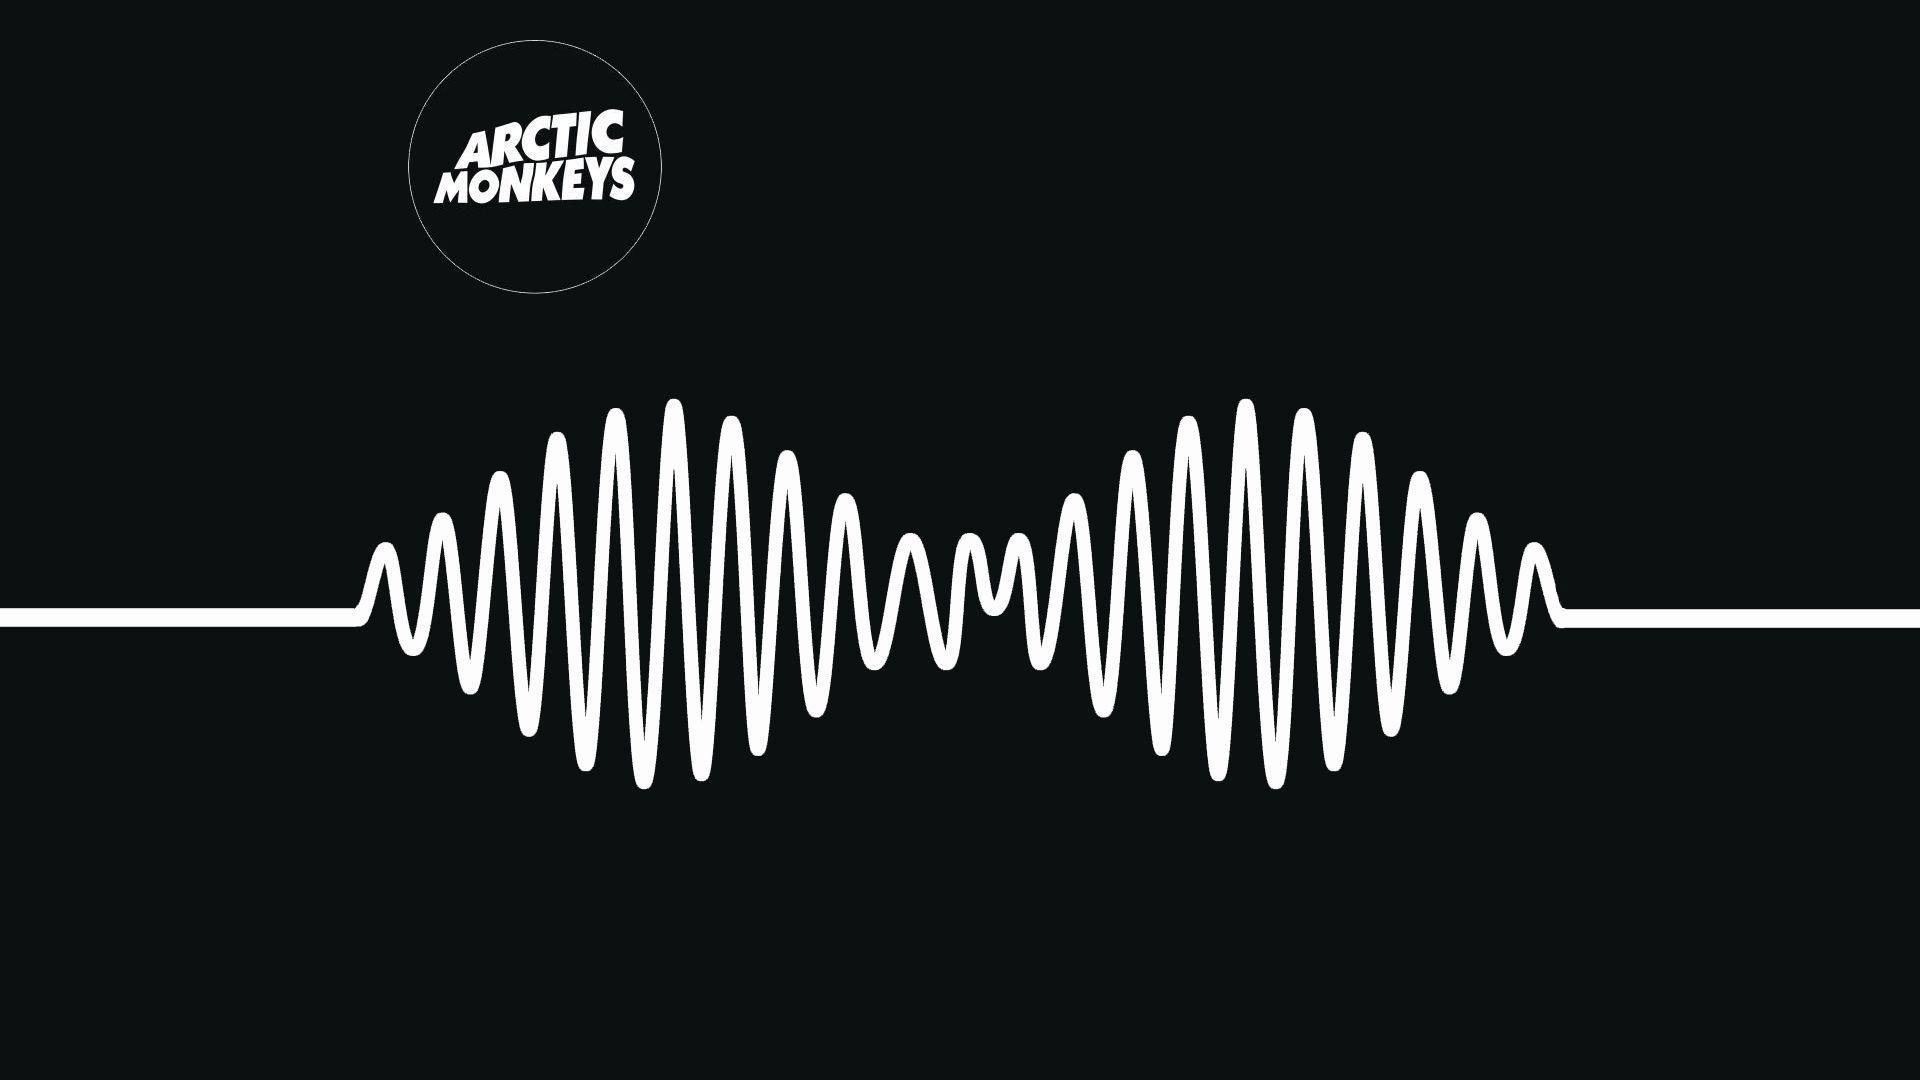 Seeing Arctic Monkeys At The 02 London Arctic Monkeys Wallpaper Monkey Wallpaper Arctic Monkeys Wallpaper Desktop